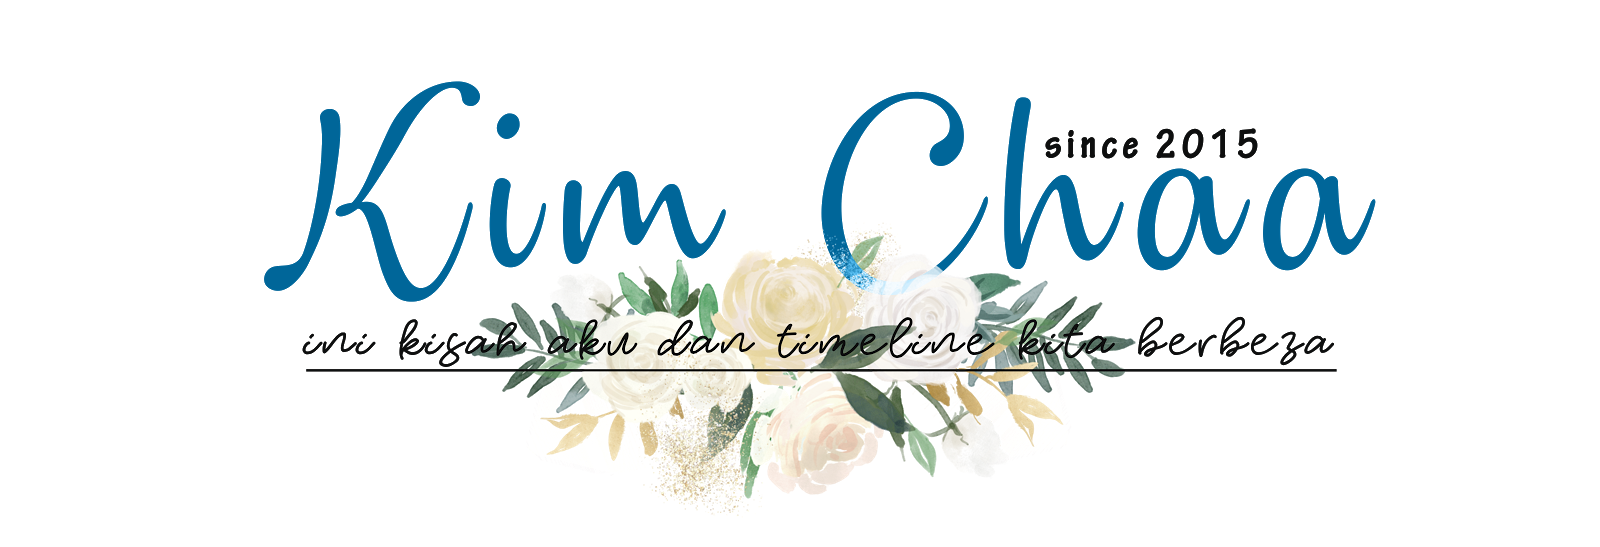 Kim Chaa